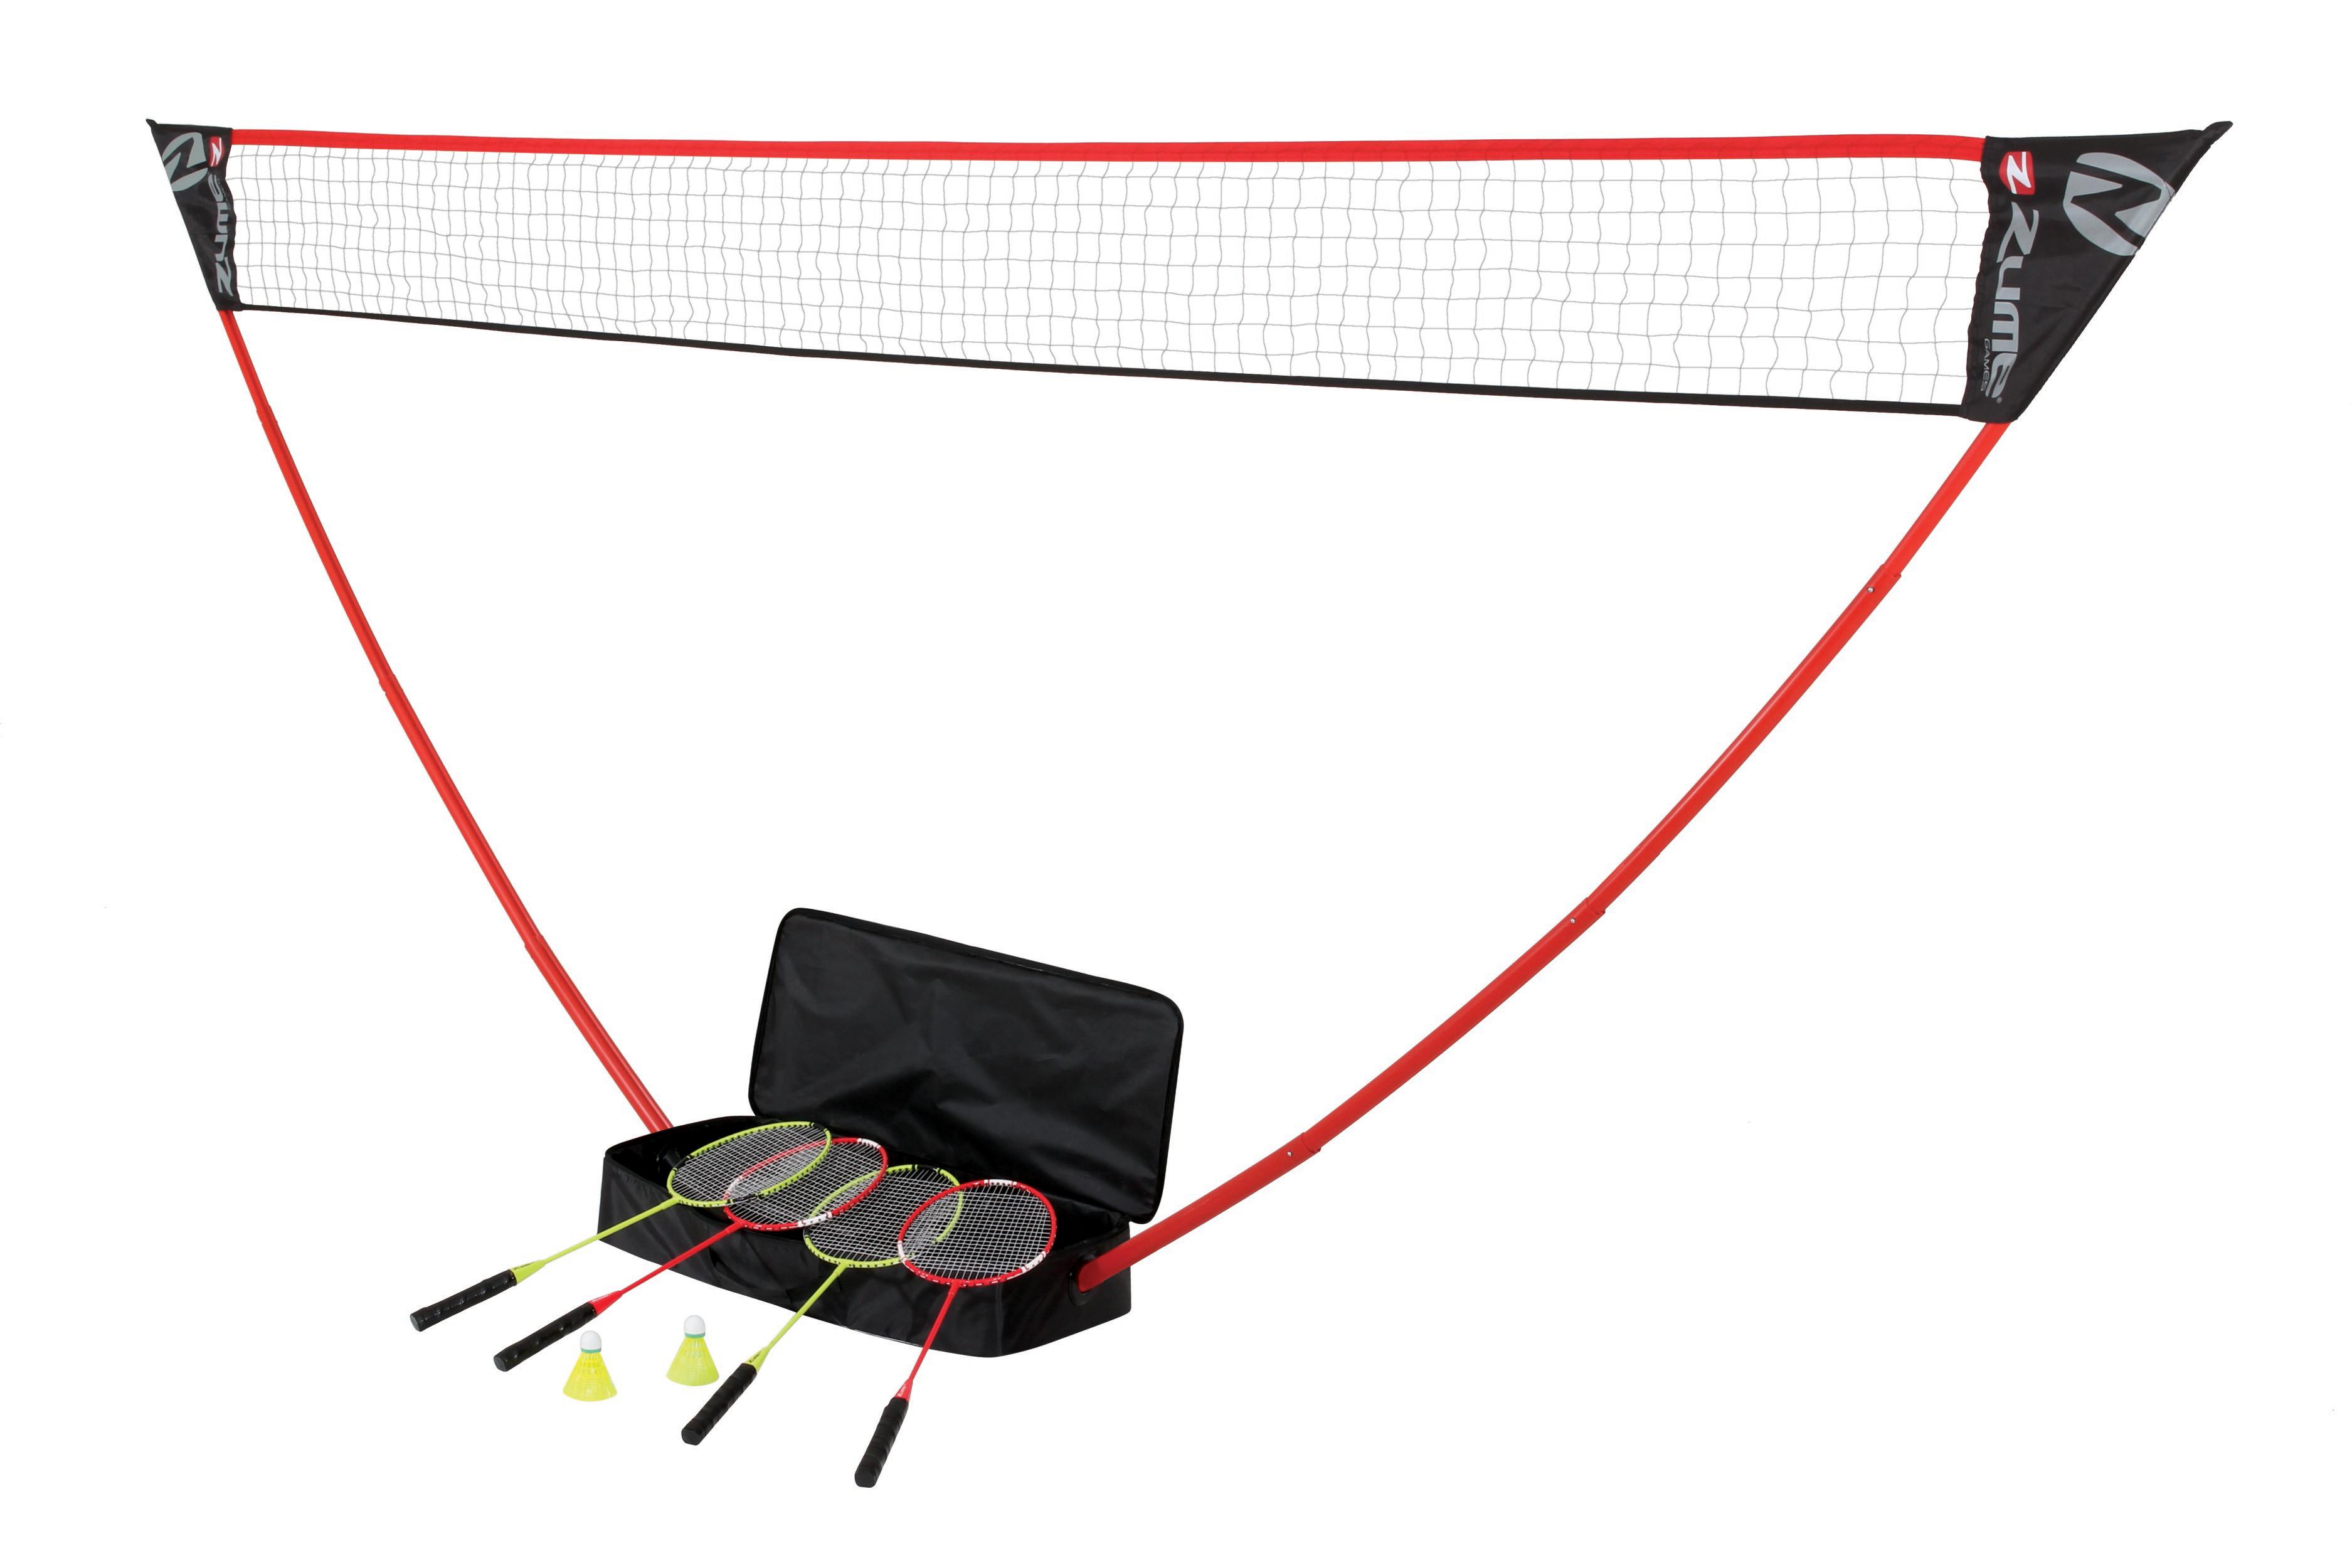 Zume Games Portable Badminton Set by Zume Games